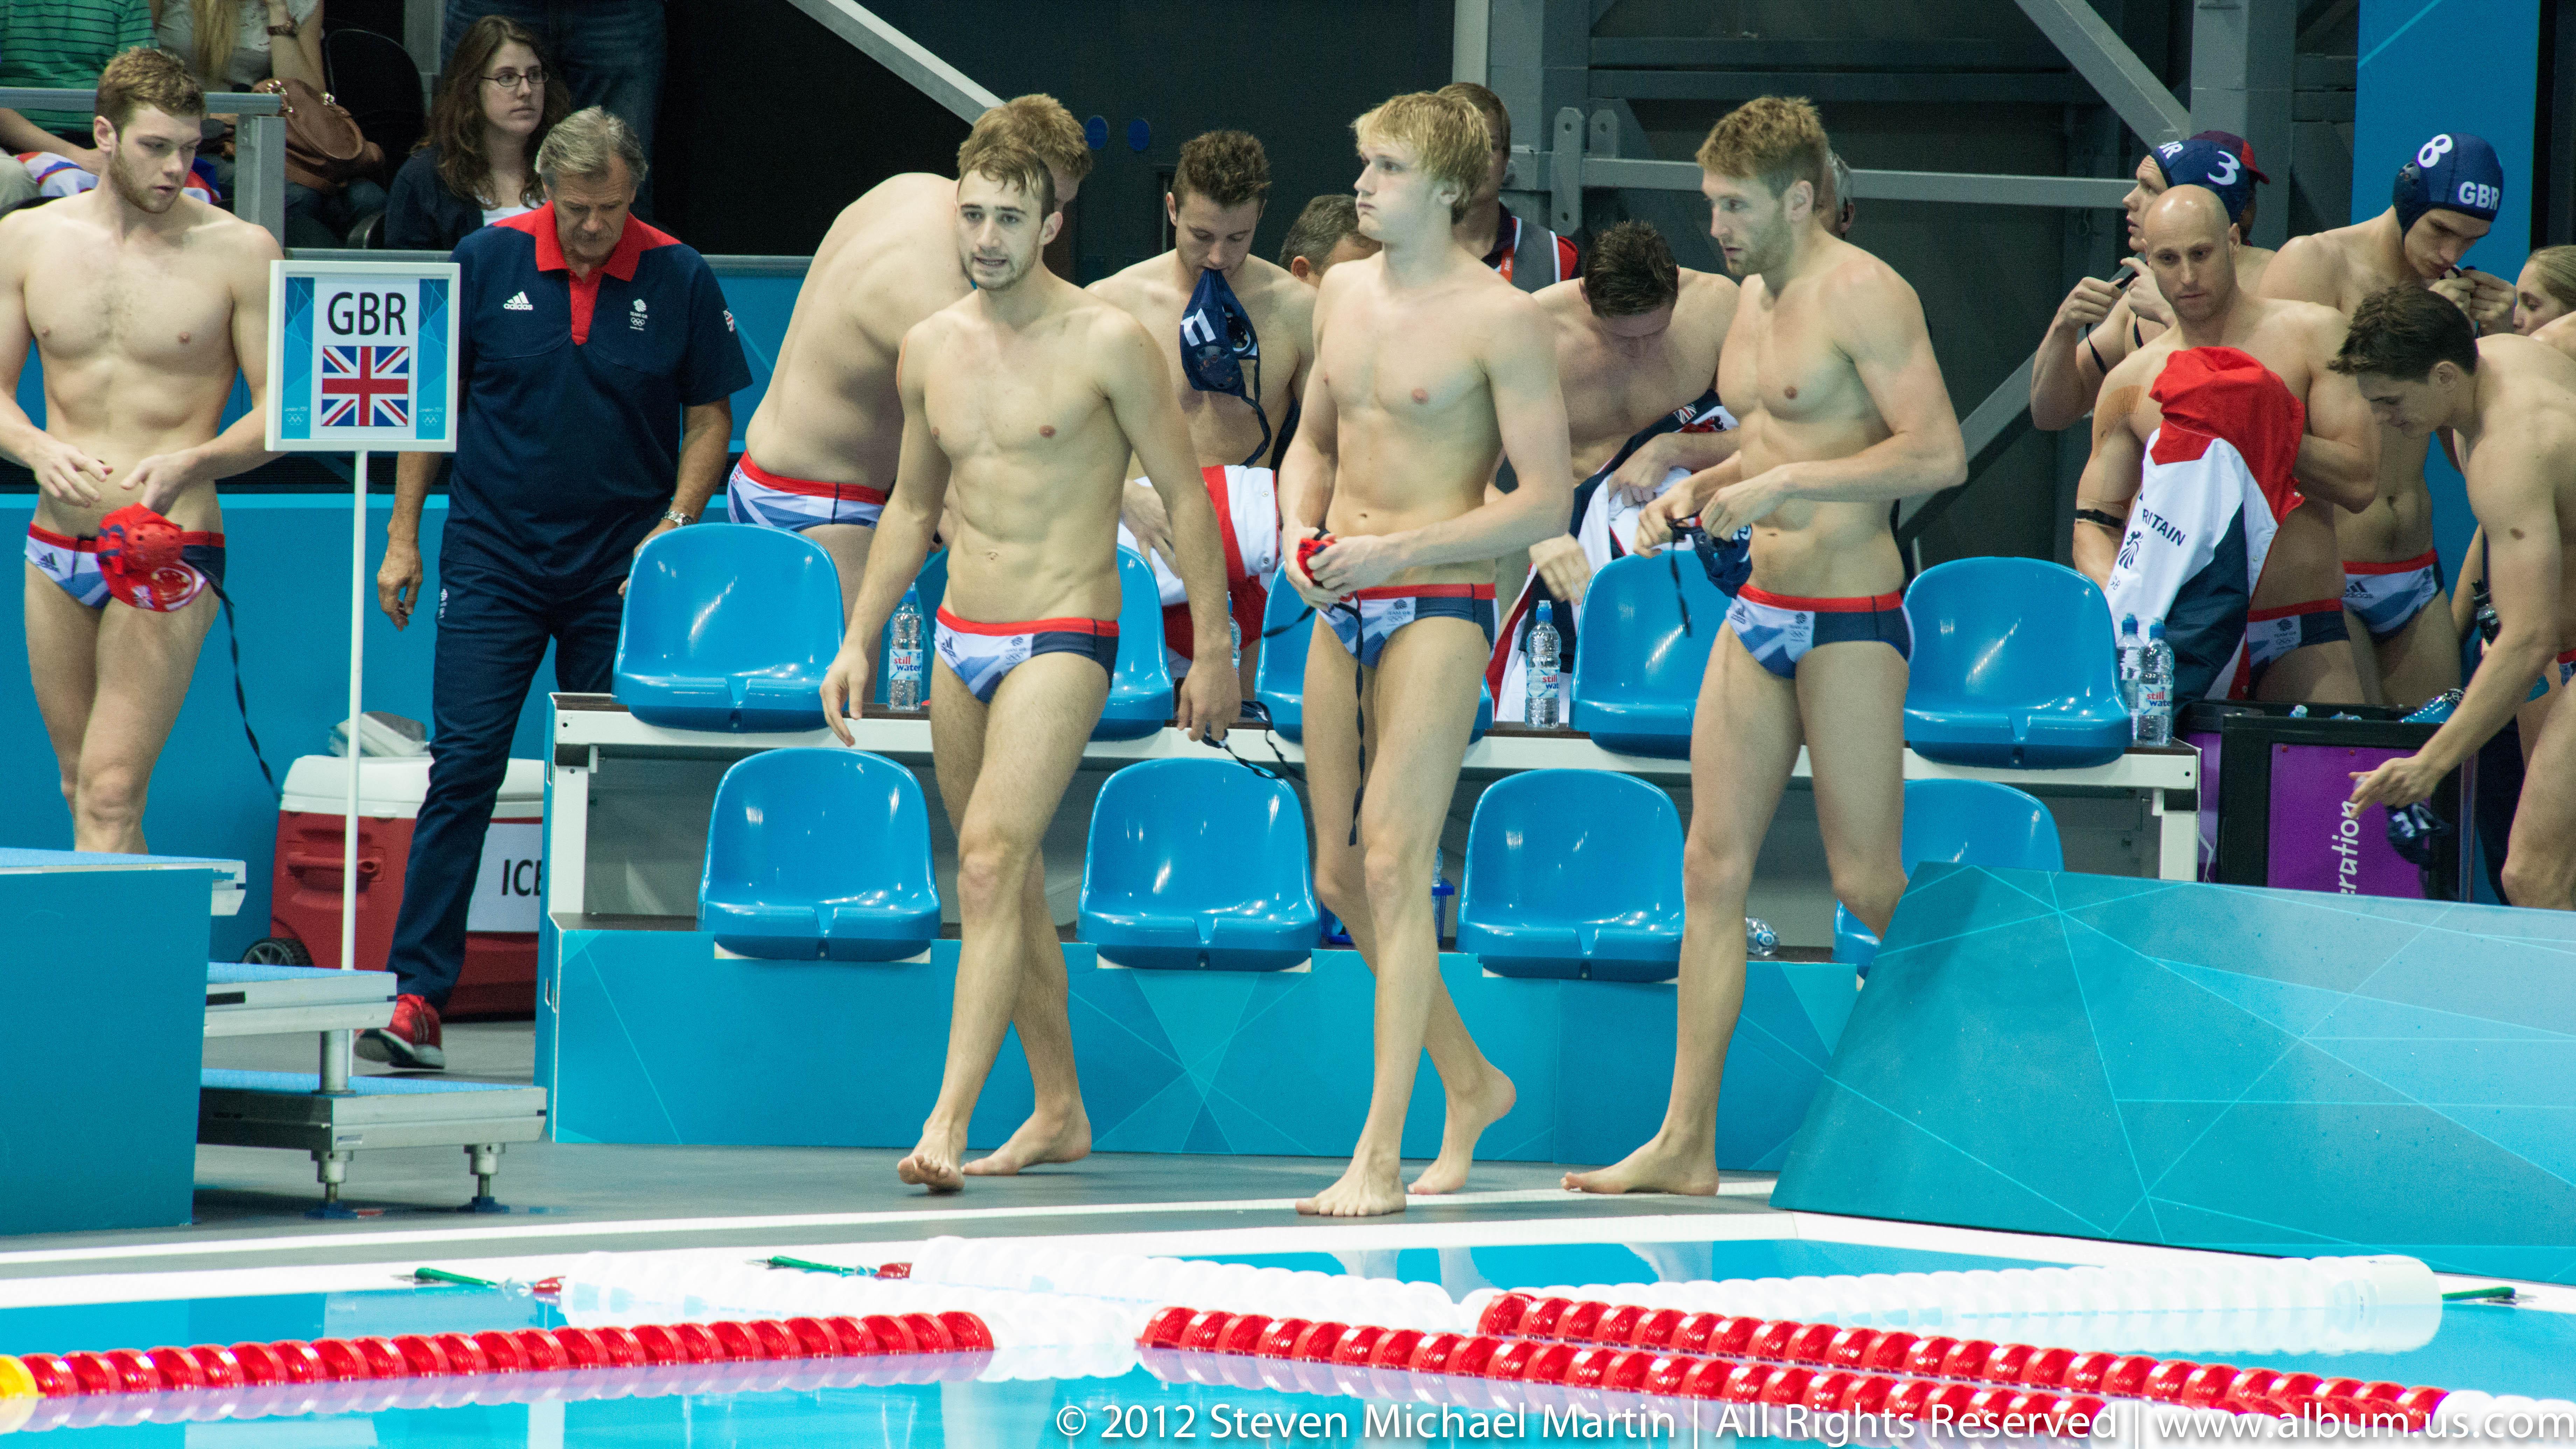 SMartin_2012 Olympics Mens Water Polo_4790016